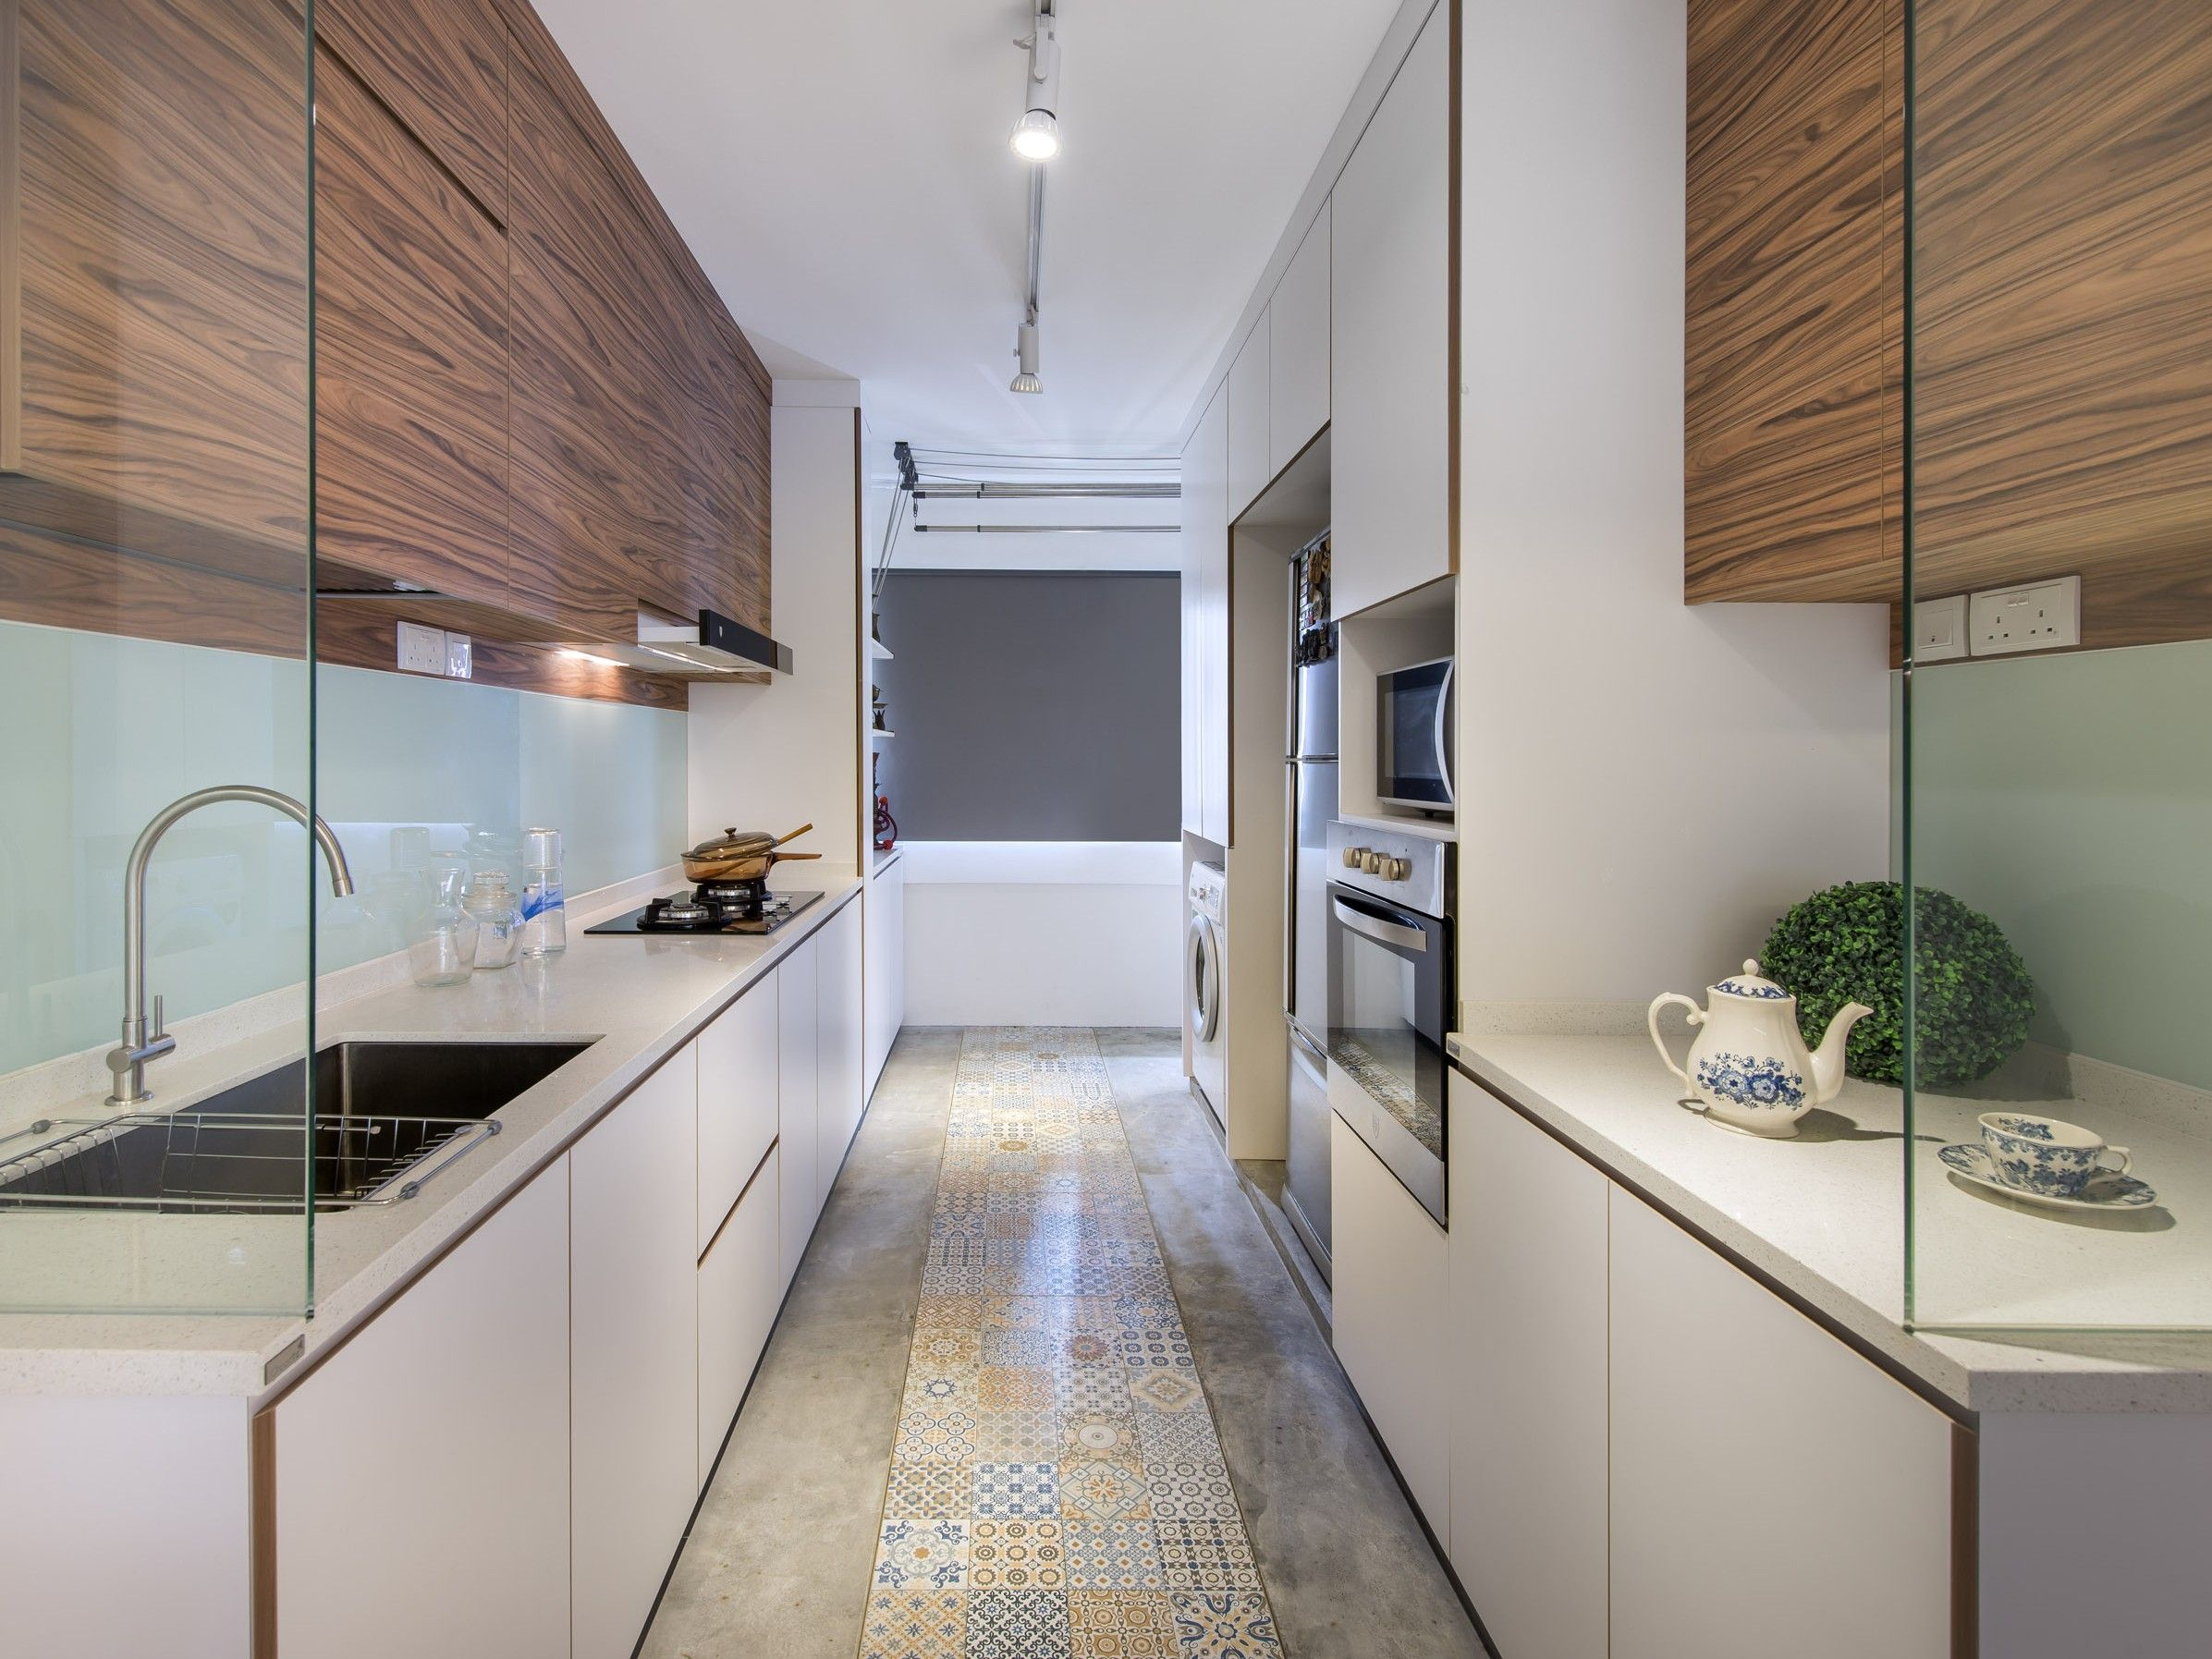 mixed flooring for kitchen past present home decor singapore best kitchen layout on kitchen ideas singapore id=77250